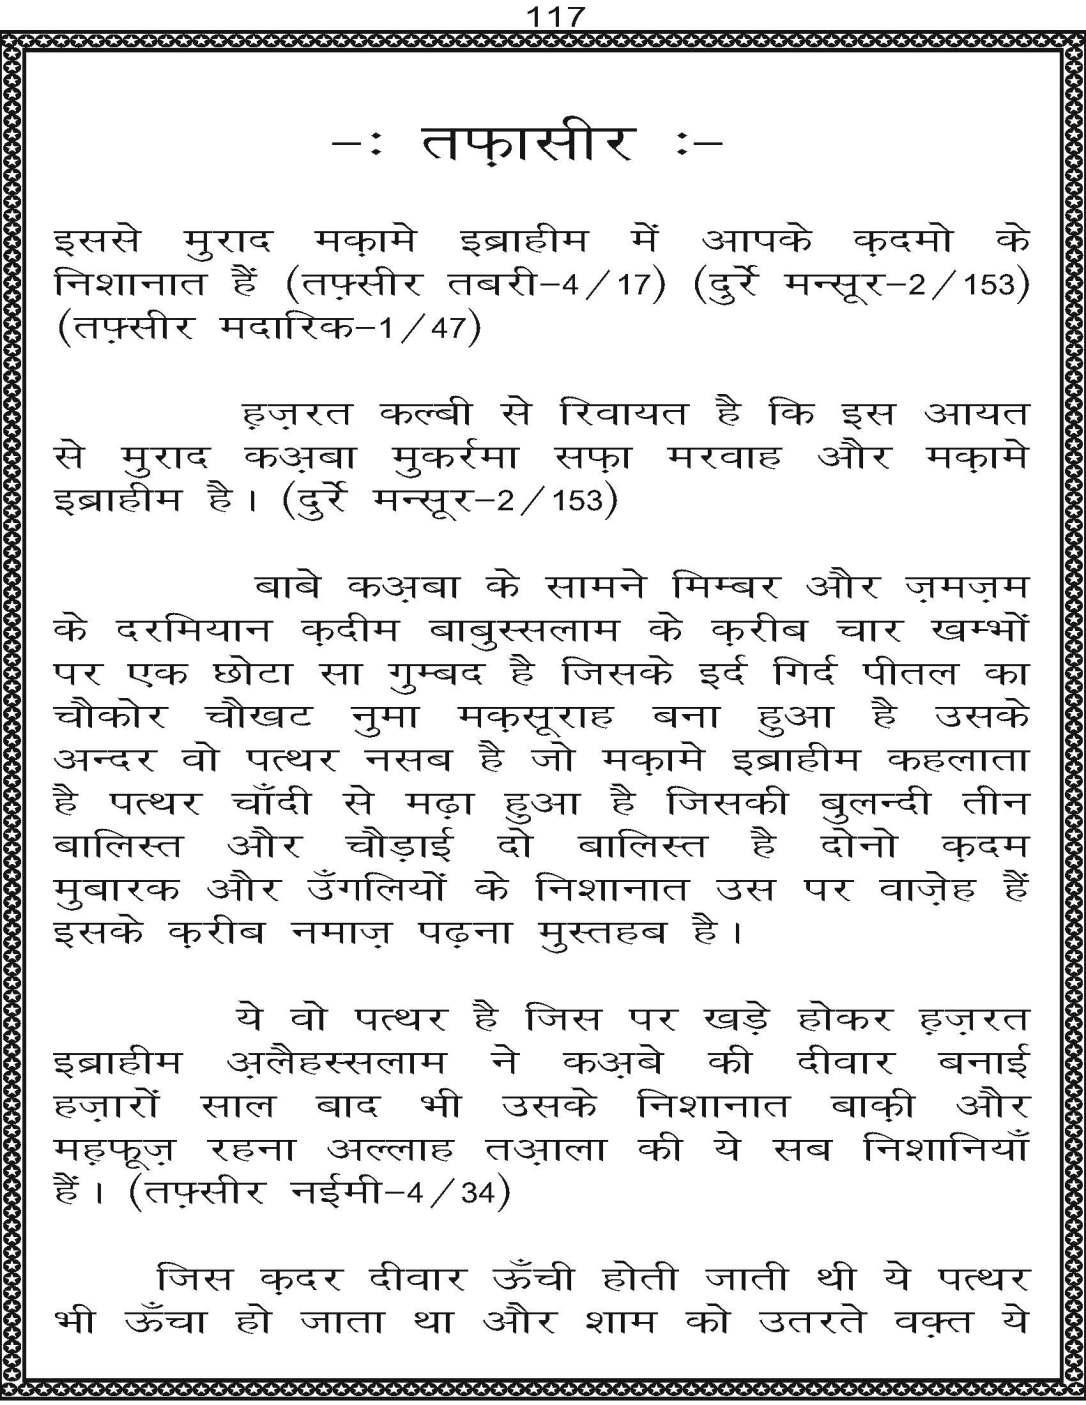 AzmateTaziyadari_Page_117